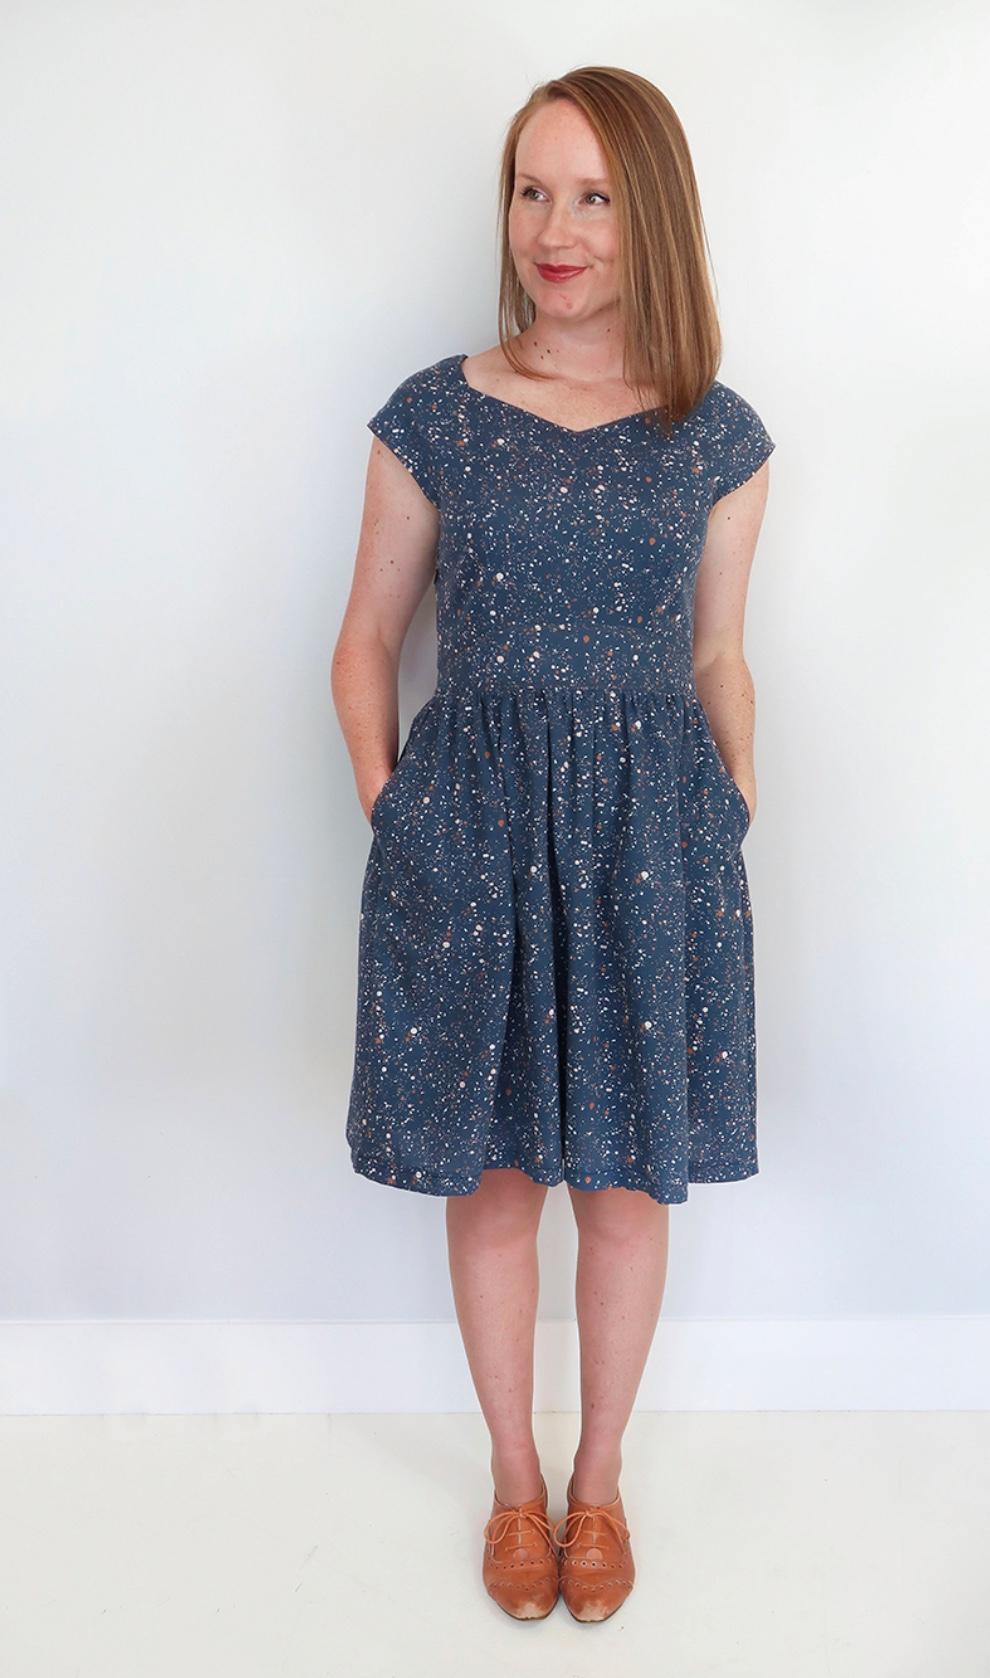 Raine dress from Jennifer Lauren Handmade